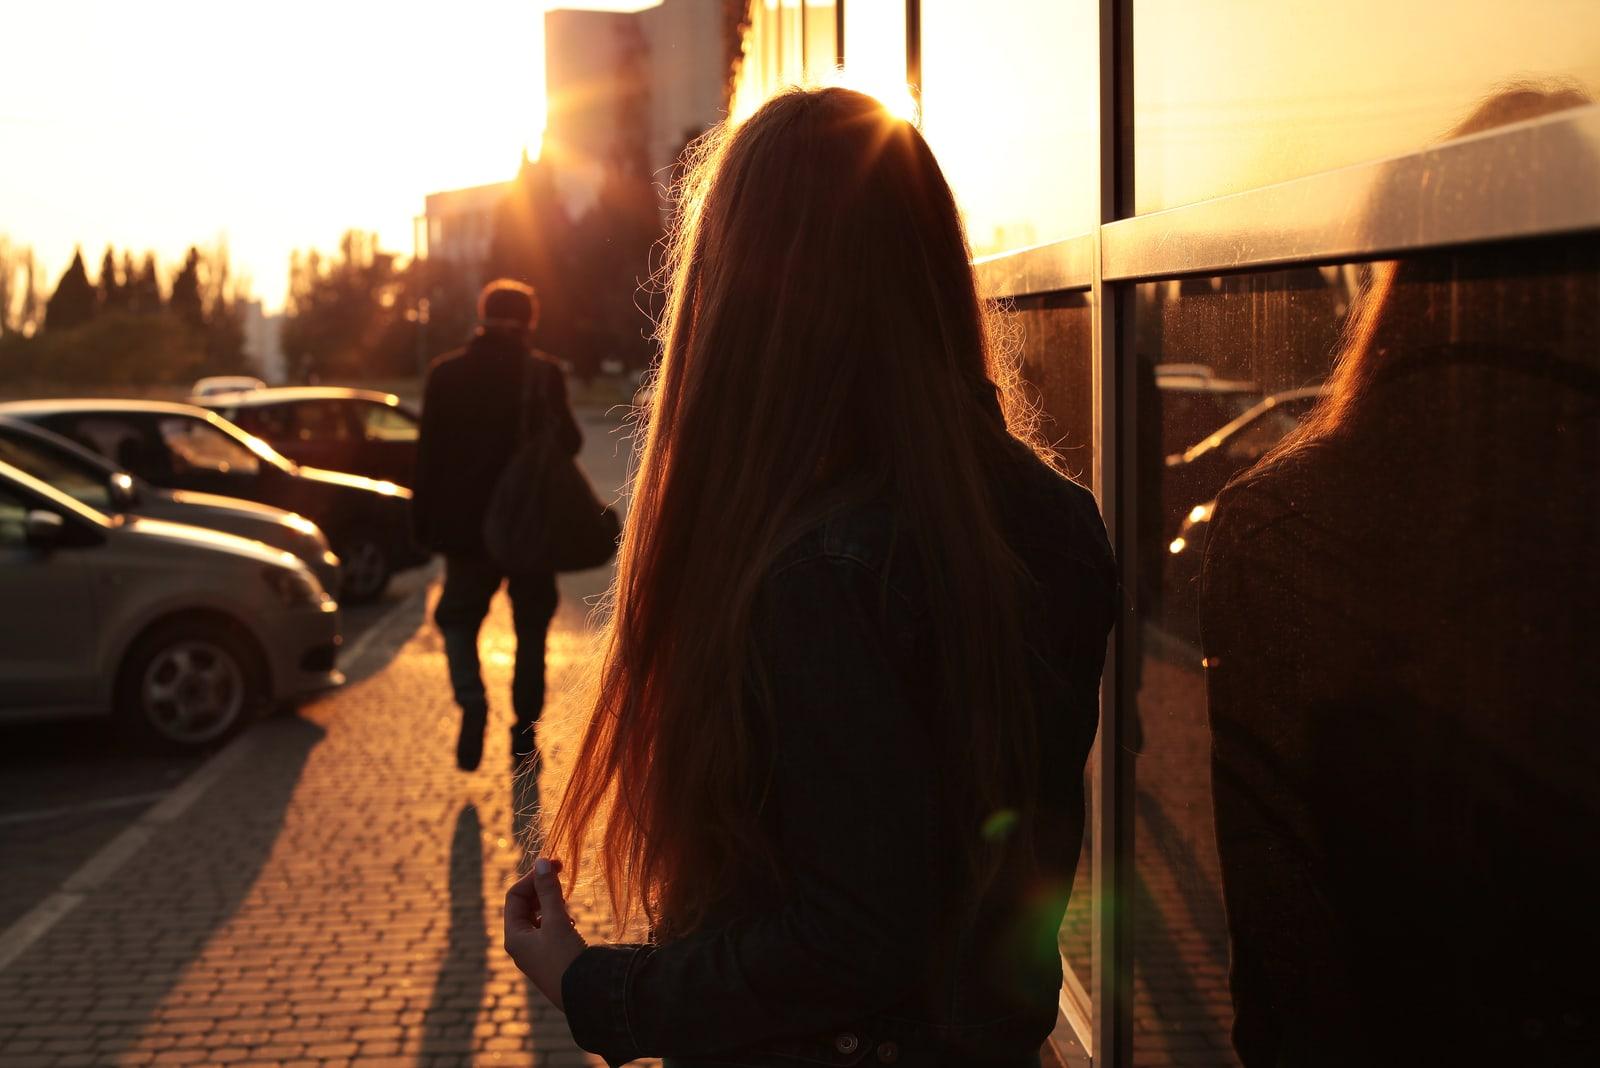 woman watching man leaving her